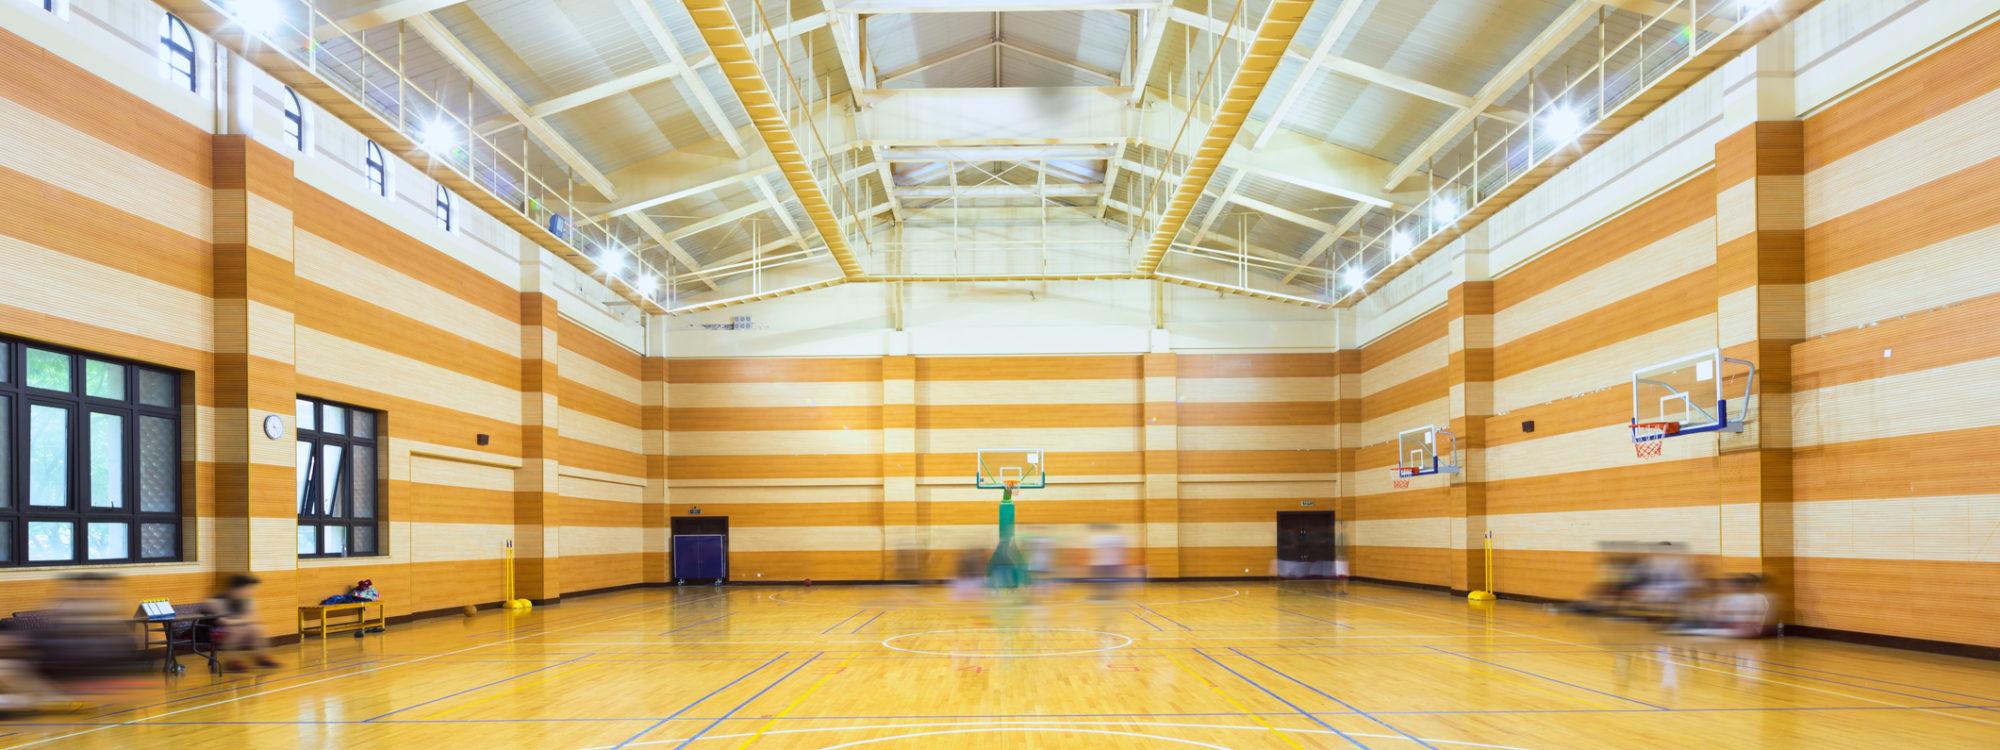 empty basketball court in modern gym